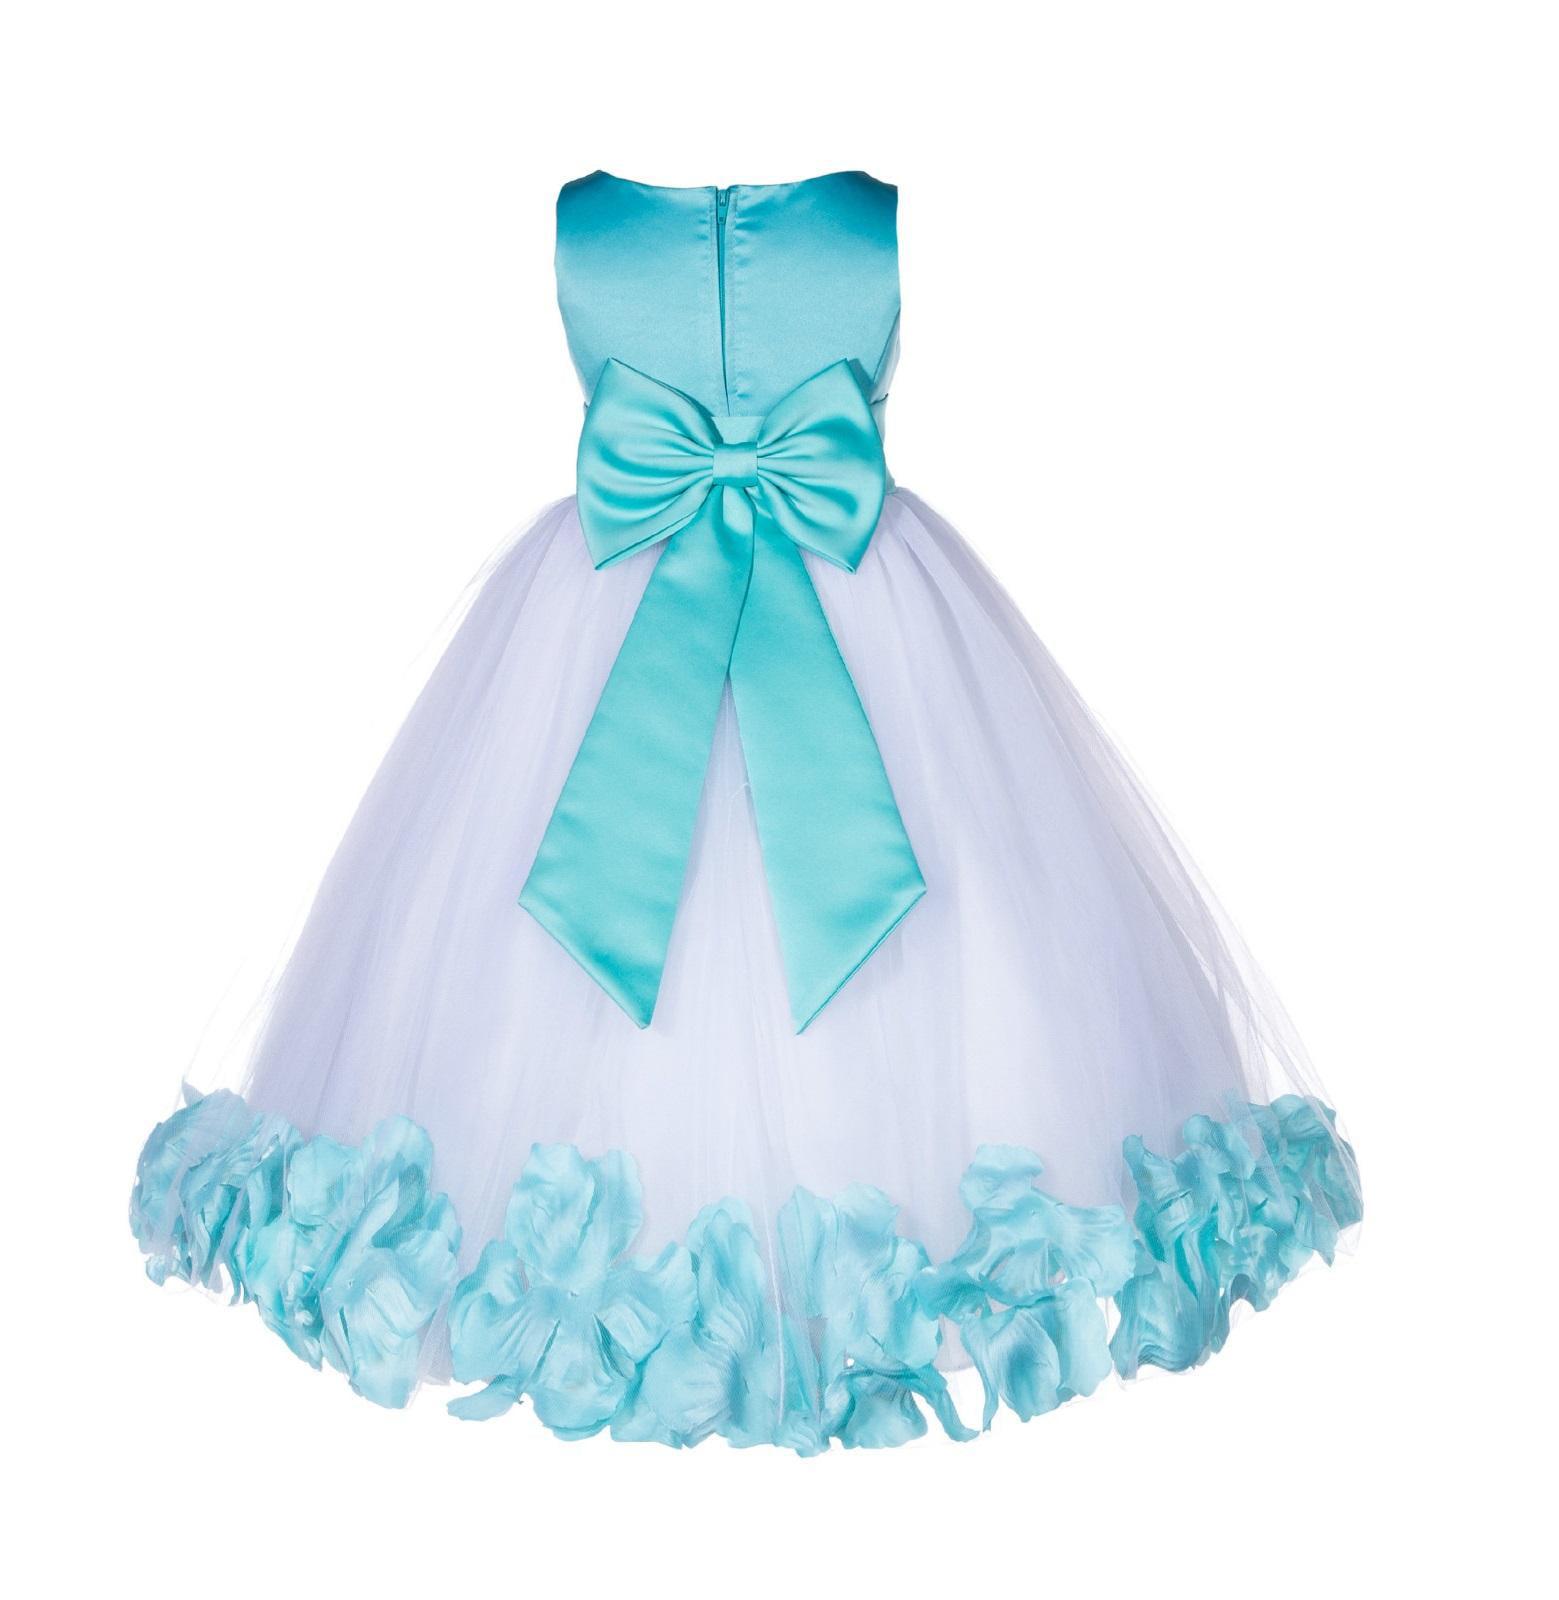 886fd6b90 Ekidsbridal - Ekidsbridal Rose Petals Tulle Flower Girl Dress Wedding  Pageant Toddler Easter Recital 167T tiffany size 6 - Walmart.com